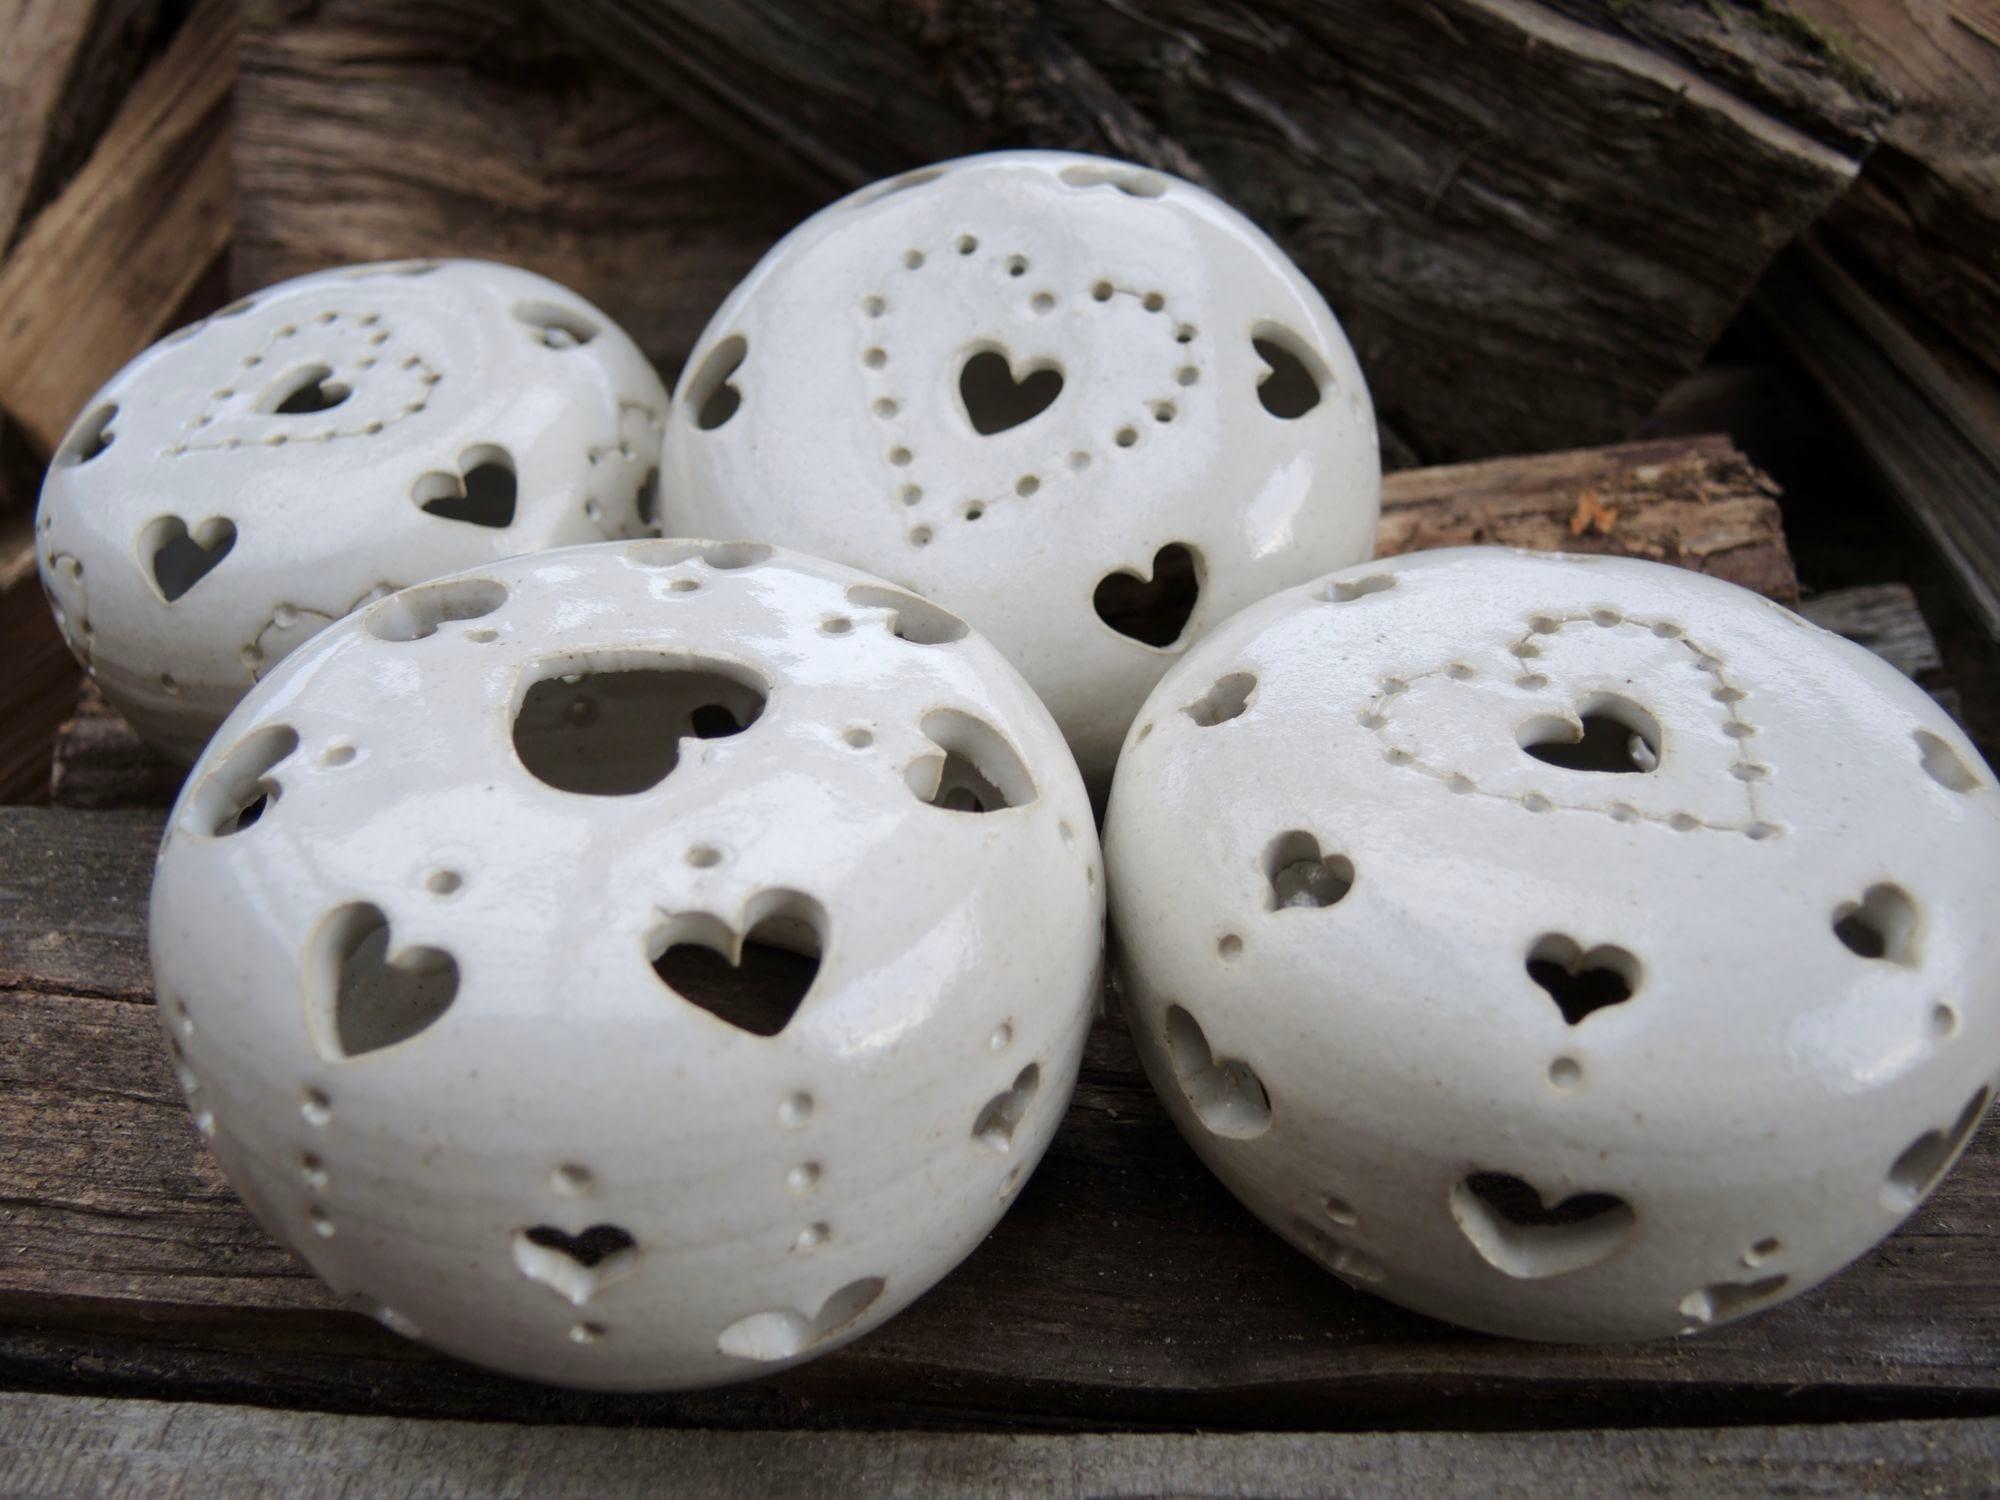 lampa koule bílá srdce světlo vánoce keramika keramikaandee dekorace